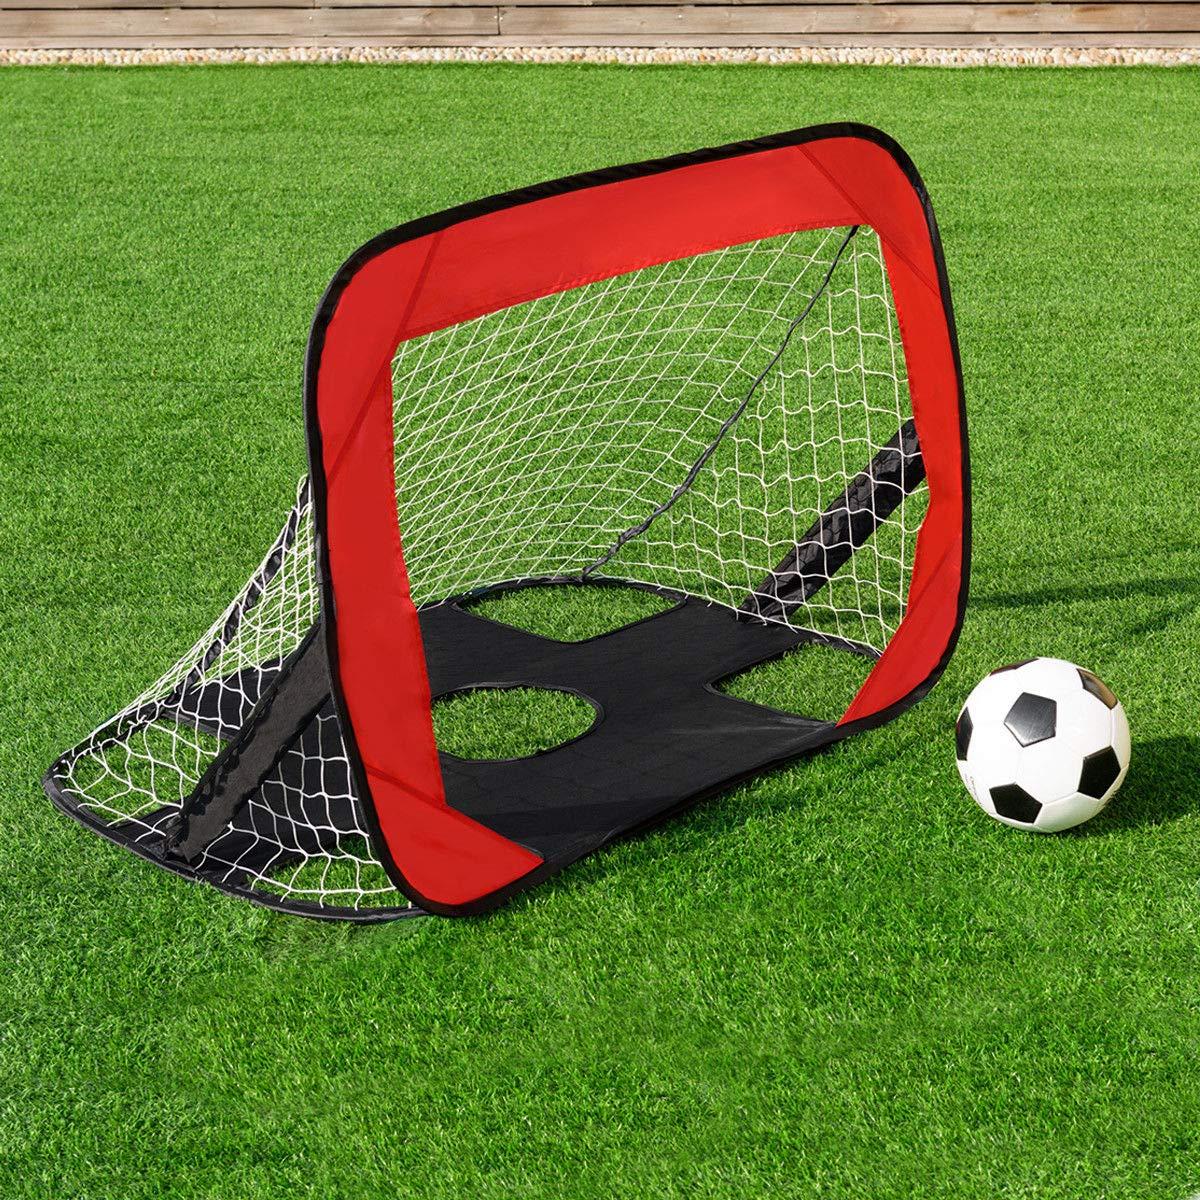 KCHEX>>ポータブル2イン1 スポーツ ポップアップサッカーゴールネット サッカーターゲット スポーツ キャリーバッグ付き オックスフォード生地素材で作られており、収納バッグが付属し、持ち運びが簡単です。 B07KXSH7R1, スポーツパラダイス:c9c704f3 --- zonespirits.xyz